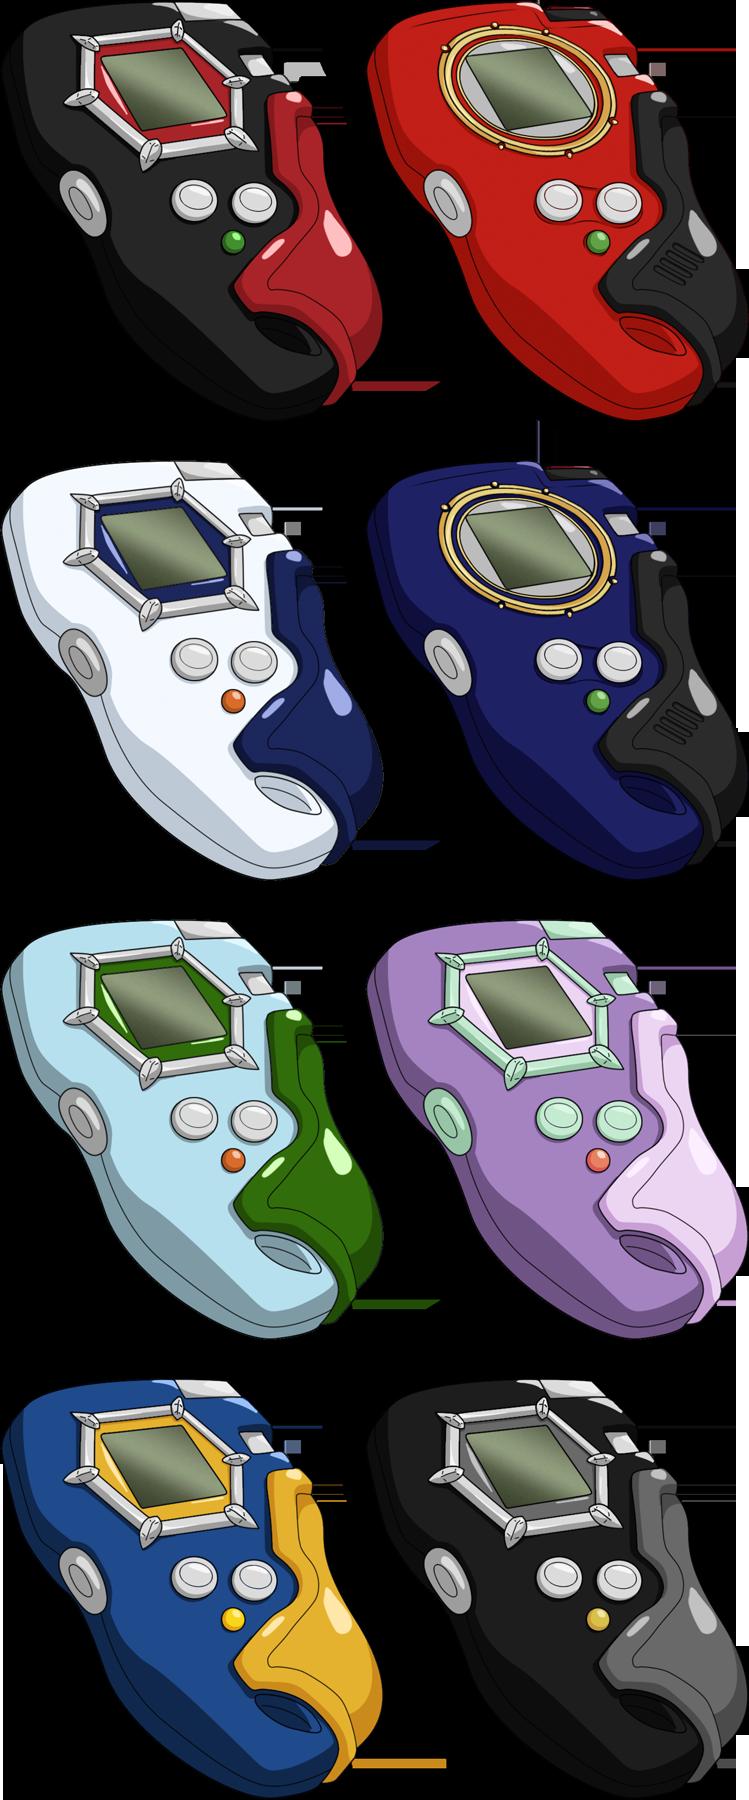 Digimon 3 evolution theme latino dating 10